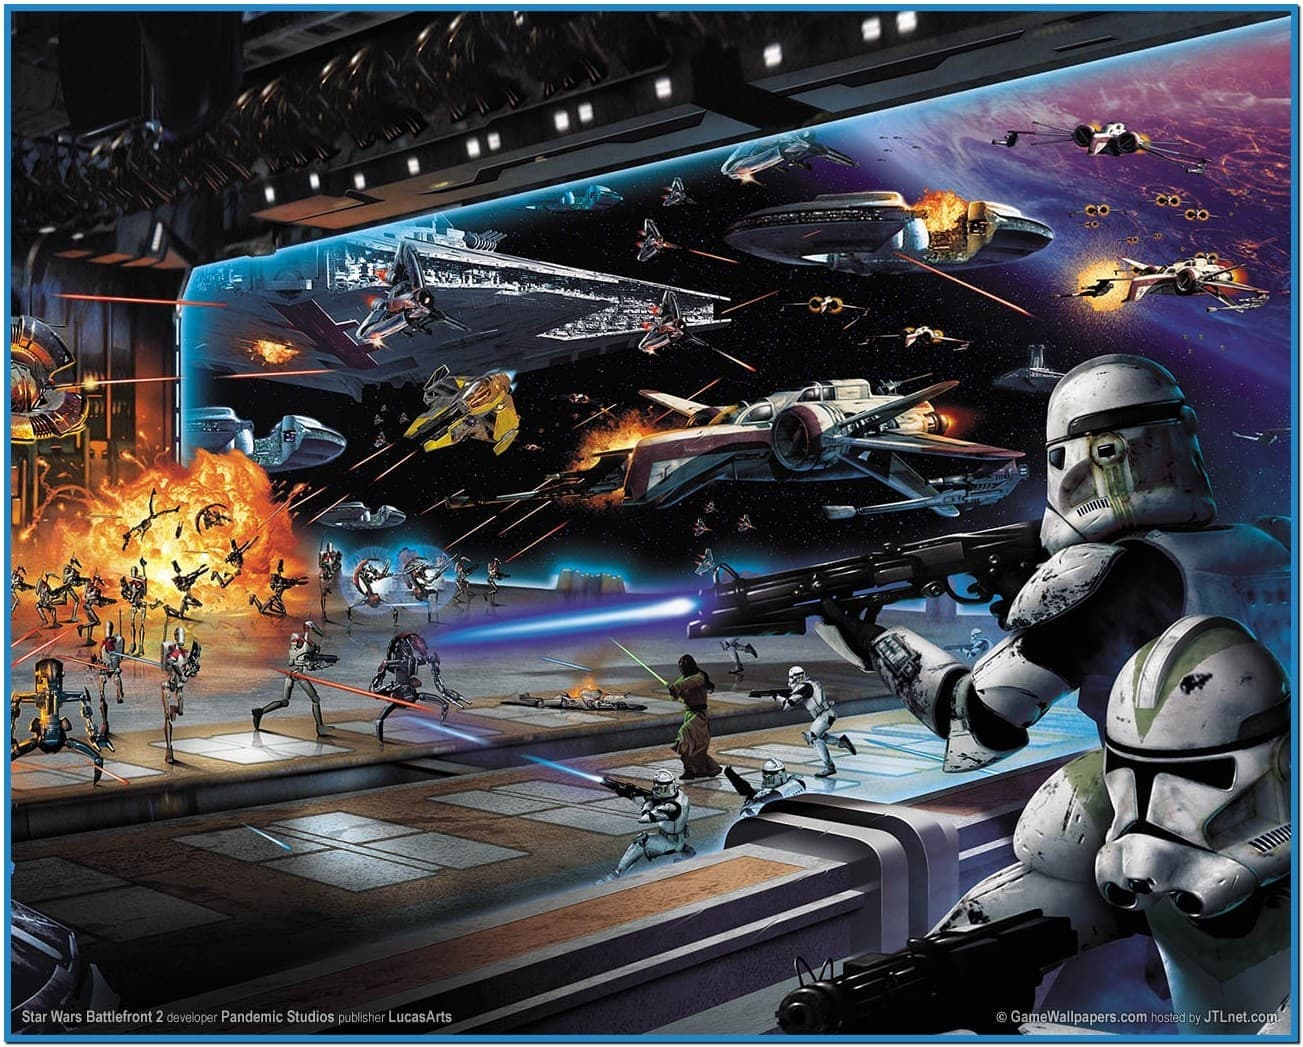 Star wars screensaver battle   Download 1303x1047